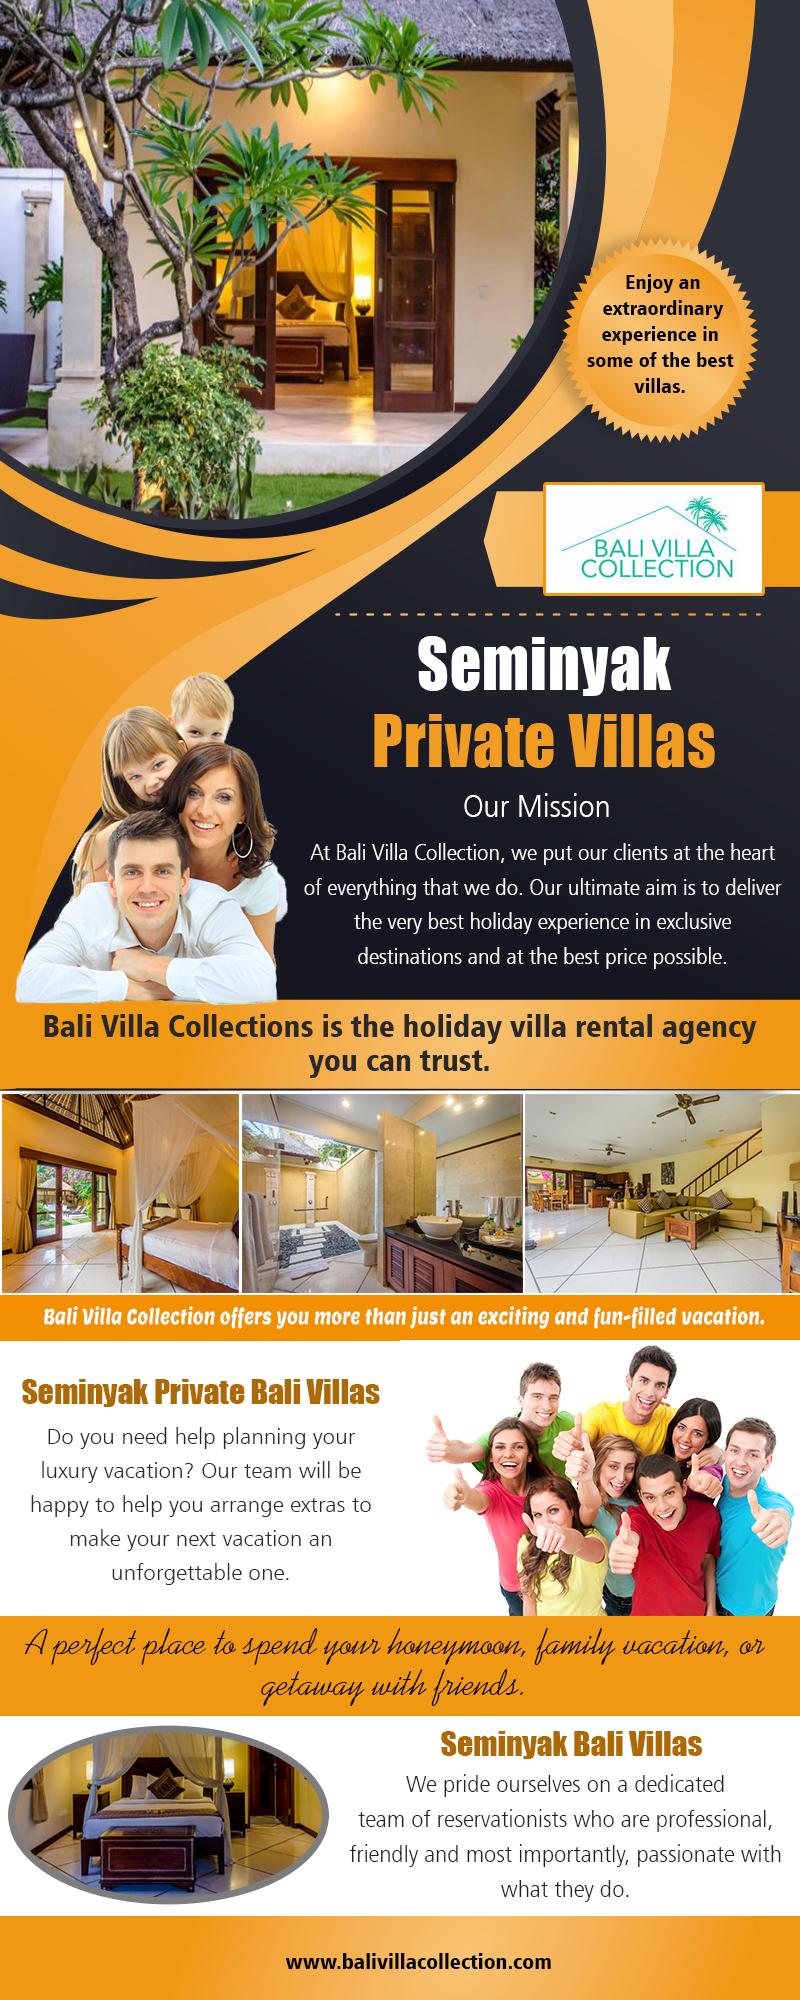 Seminyak Private in Villas